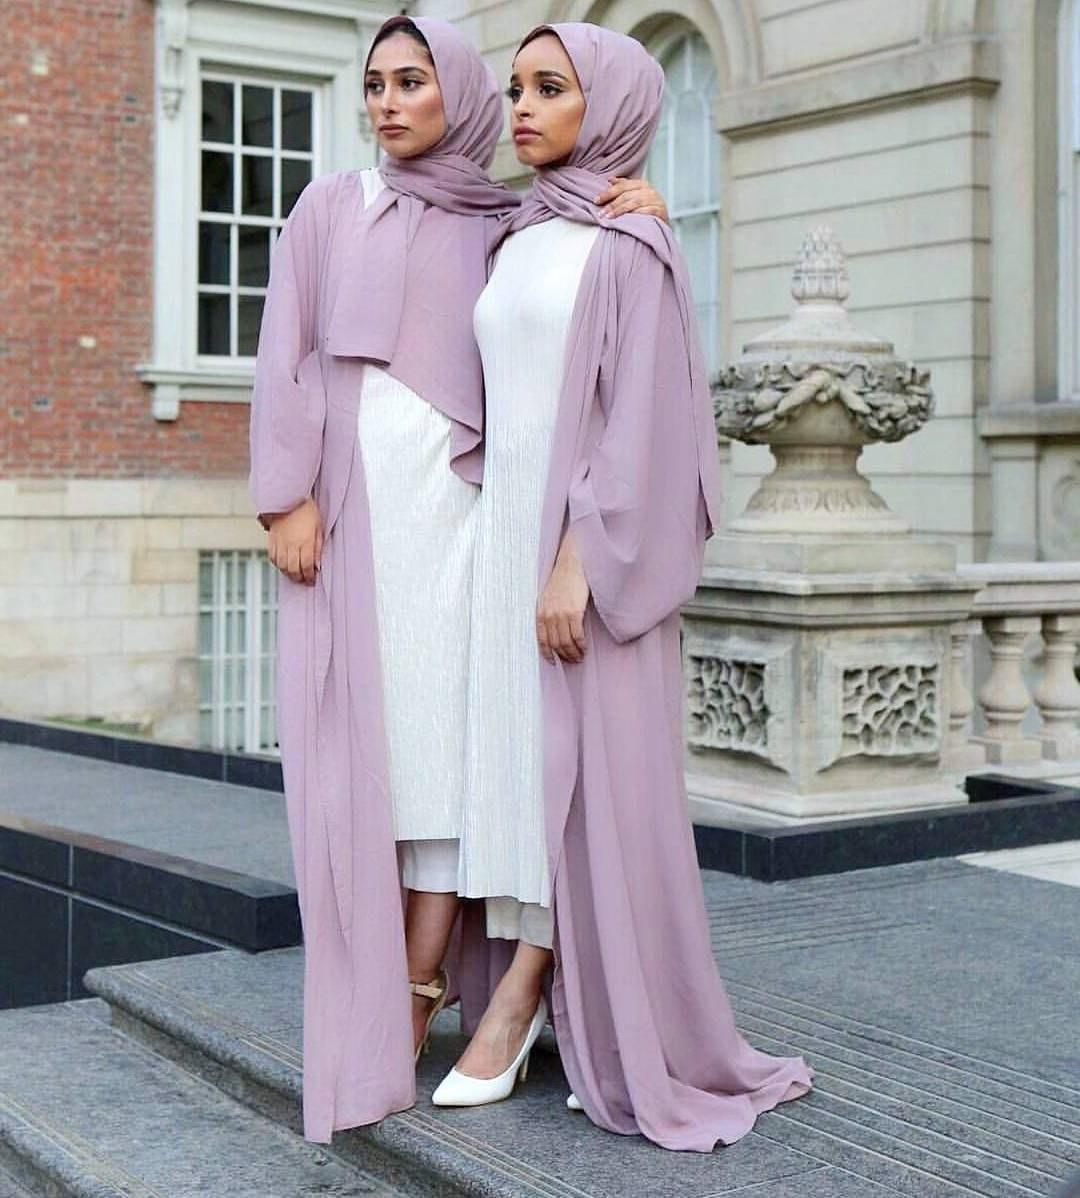 Model Model Baju Lebaran Tahun 2017 3ldq 50 Model Baju Lebaran Terbaru 2018 Modern & Elegan